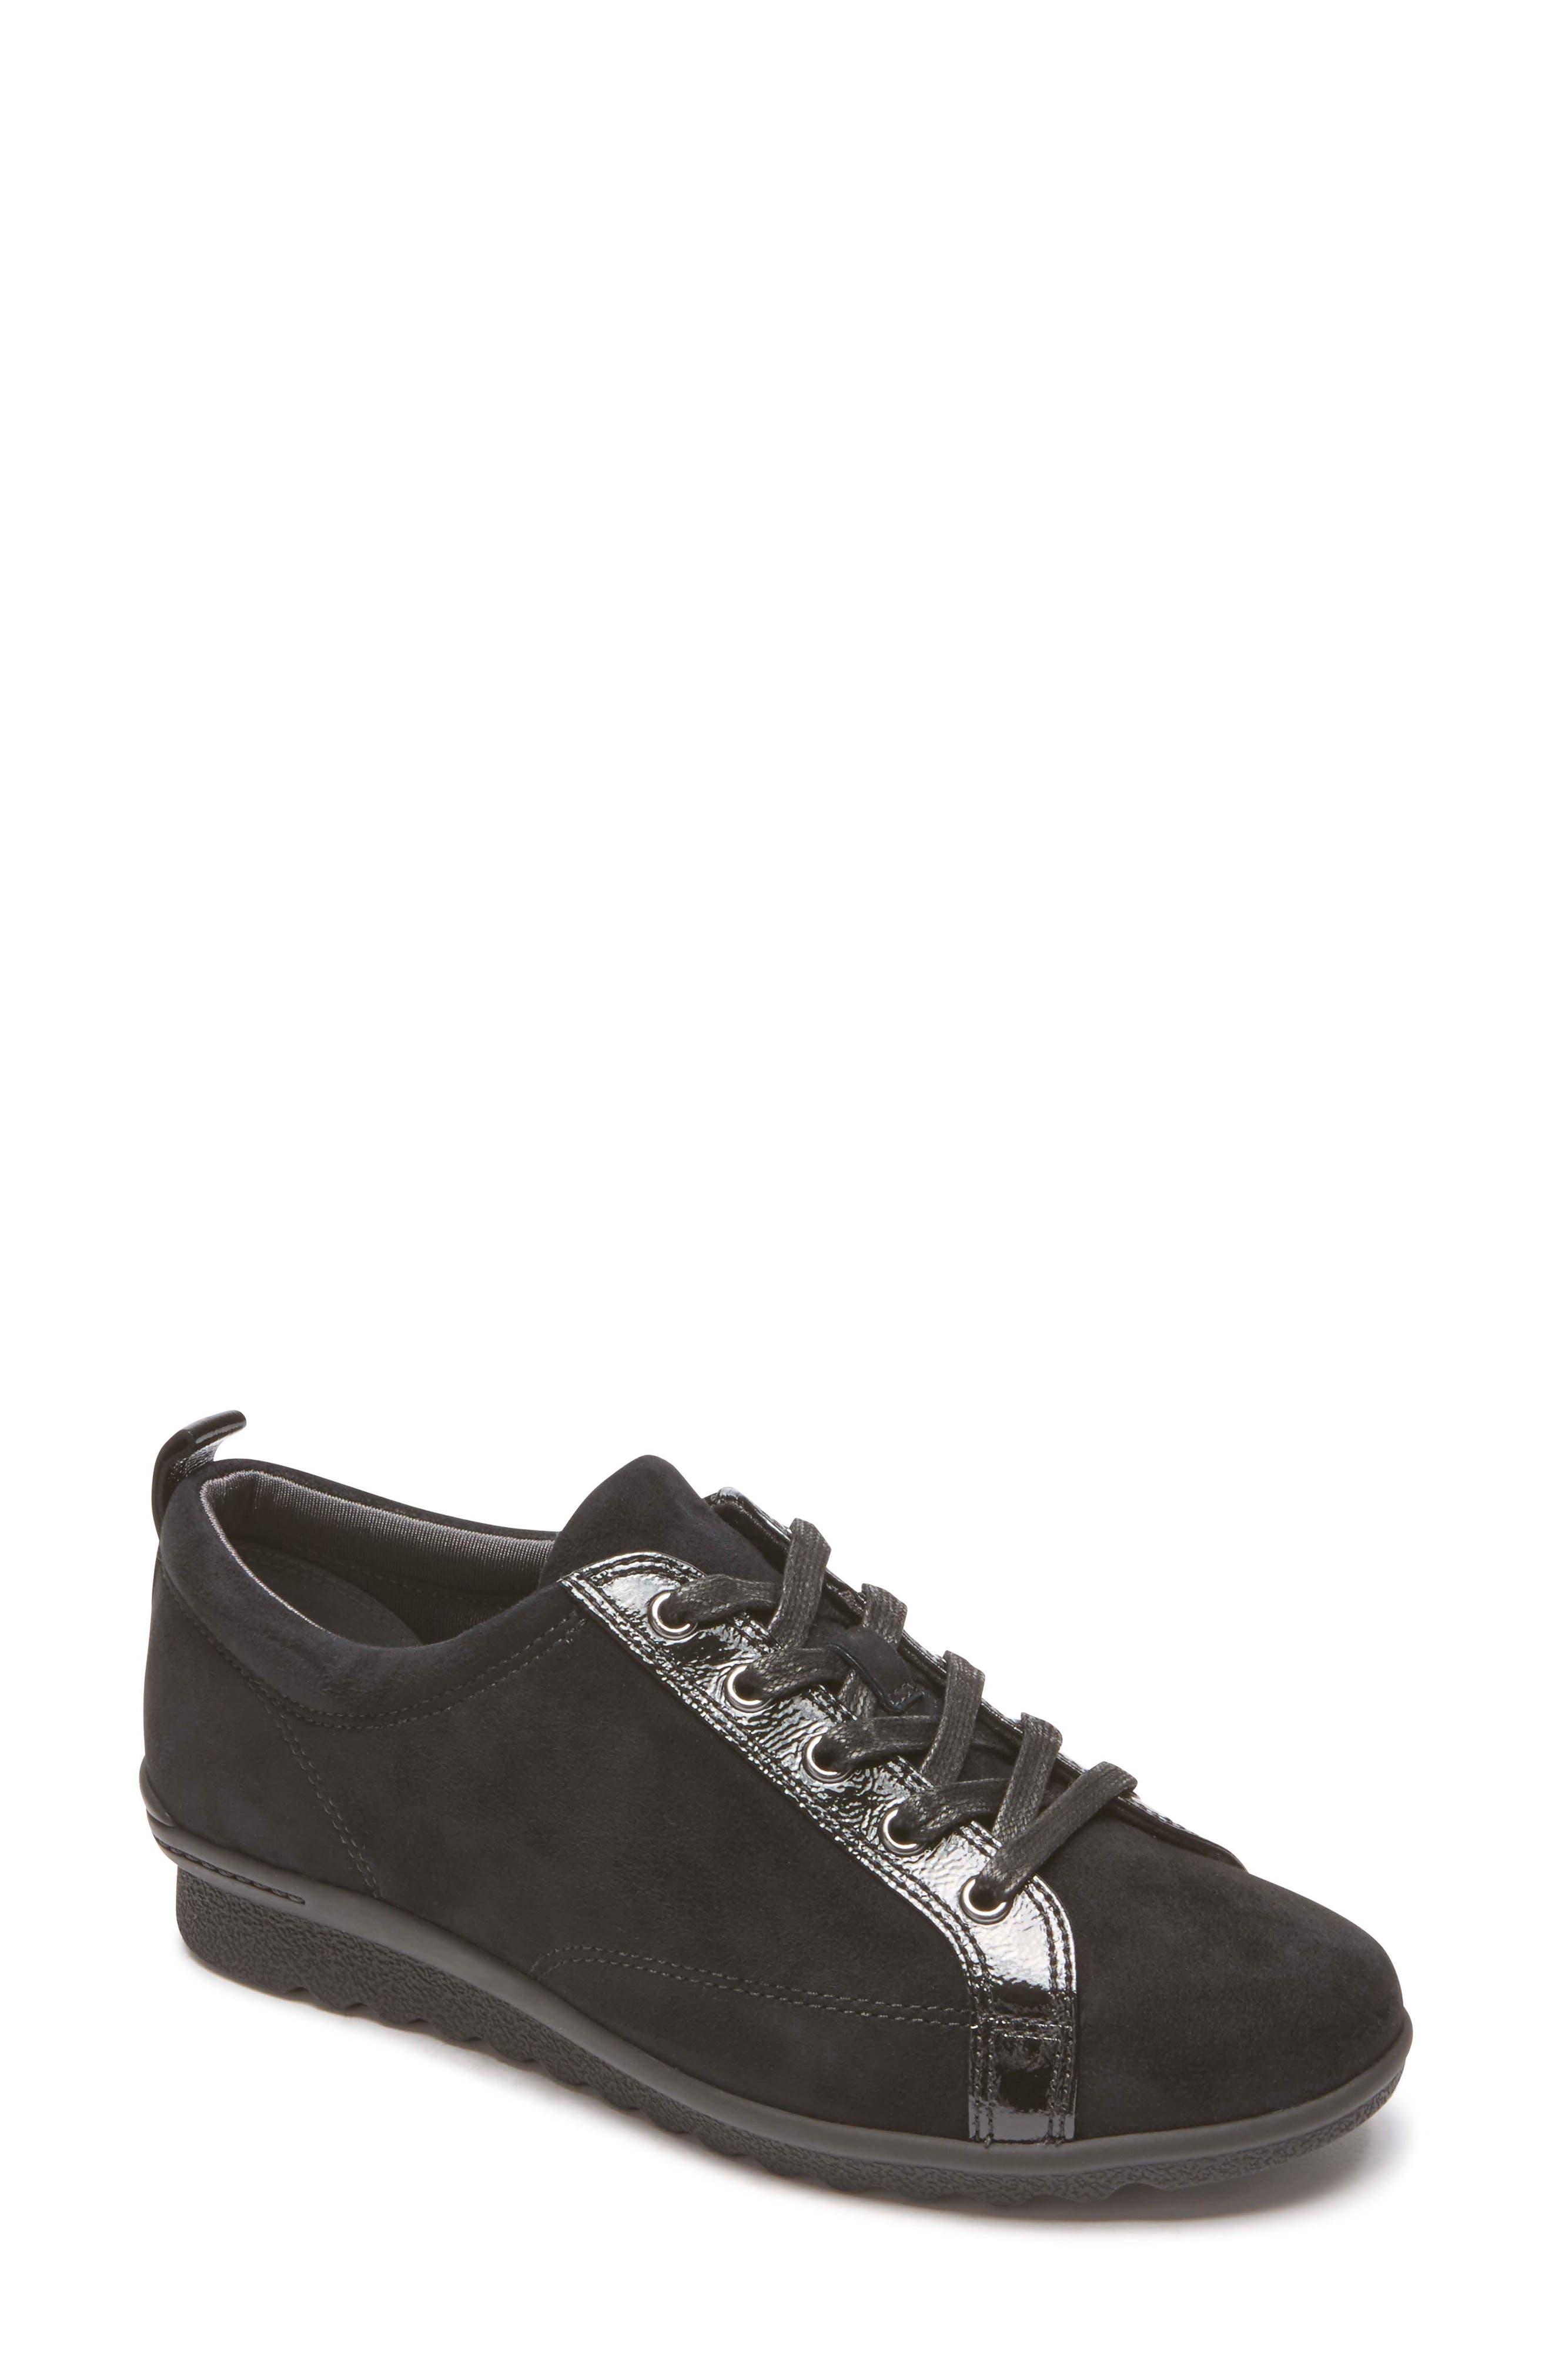 Rockport Chenole Wedge Sneaker, Black